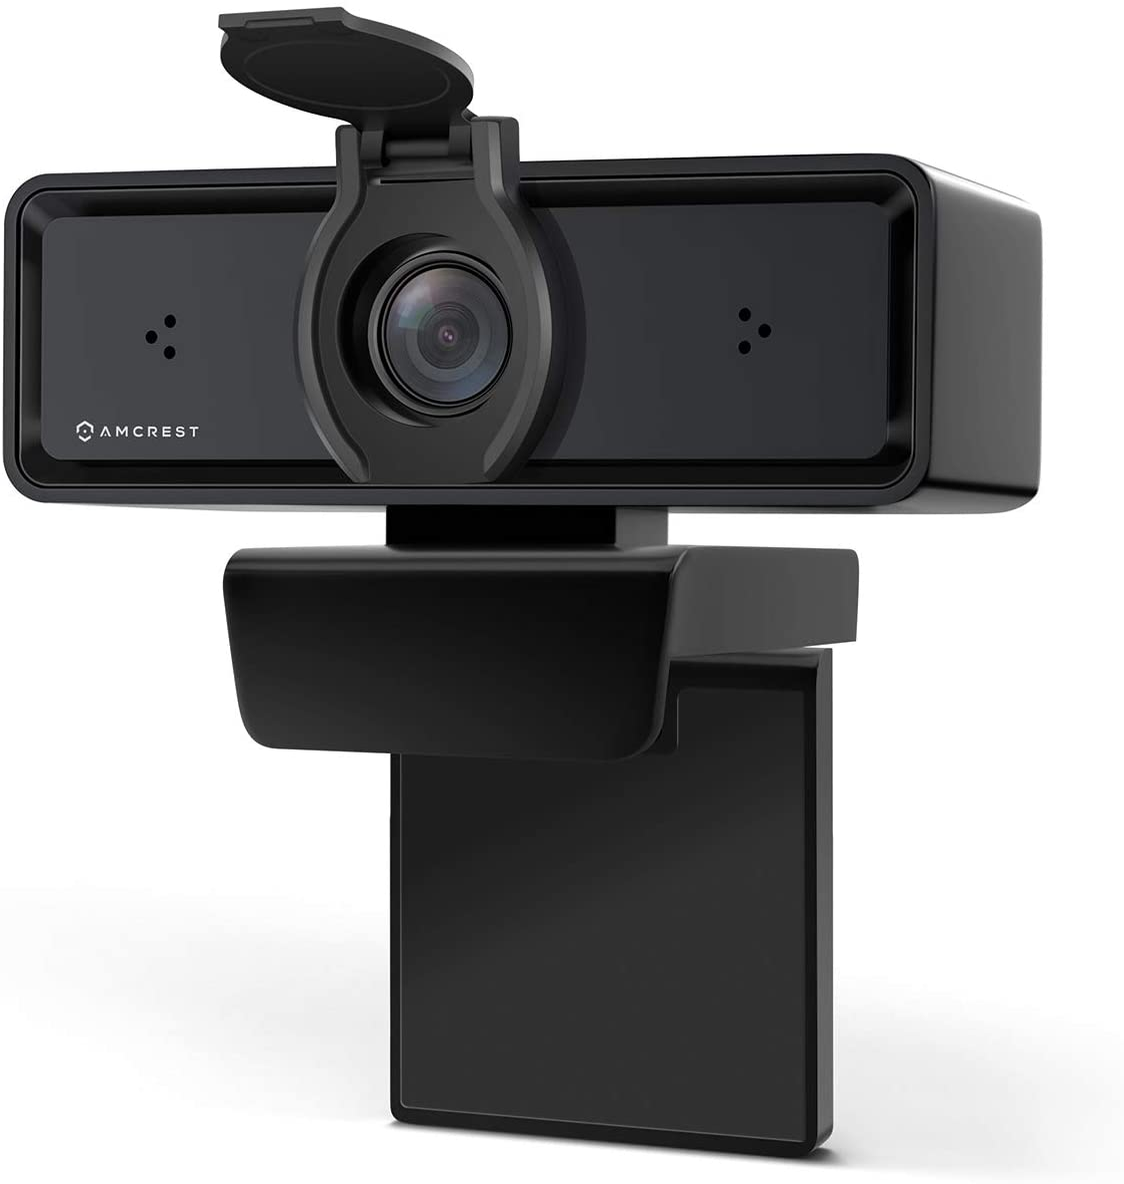 Amcrest ProStream 1080P Webcam with Dual-Microphone & Privacy Cover, Web Cam USB Camera, Computer HD Streaming Webcam for PC Desktop & Laptop, Wide Angle Lens & Sensor for Superior Low Light (AWC2198)